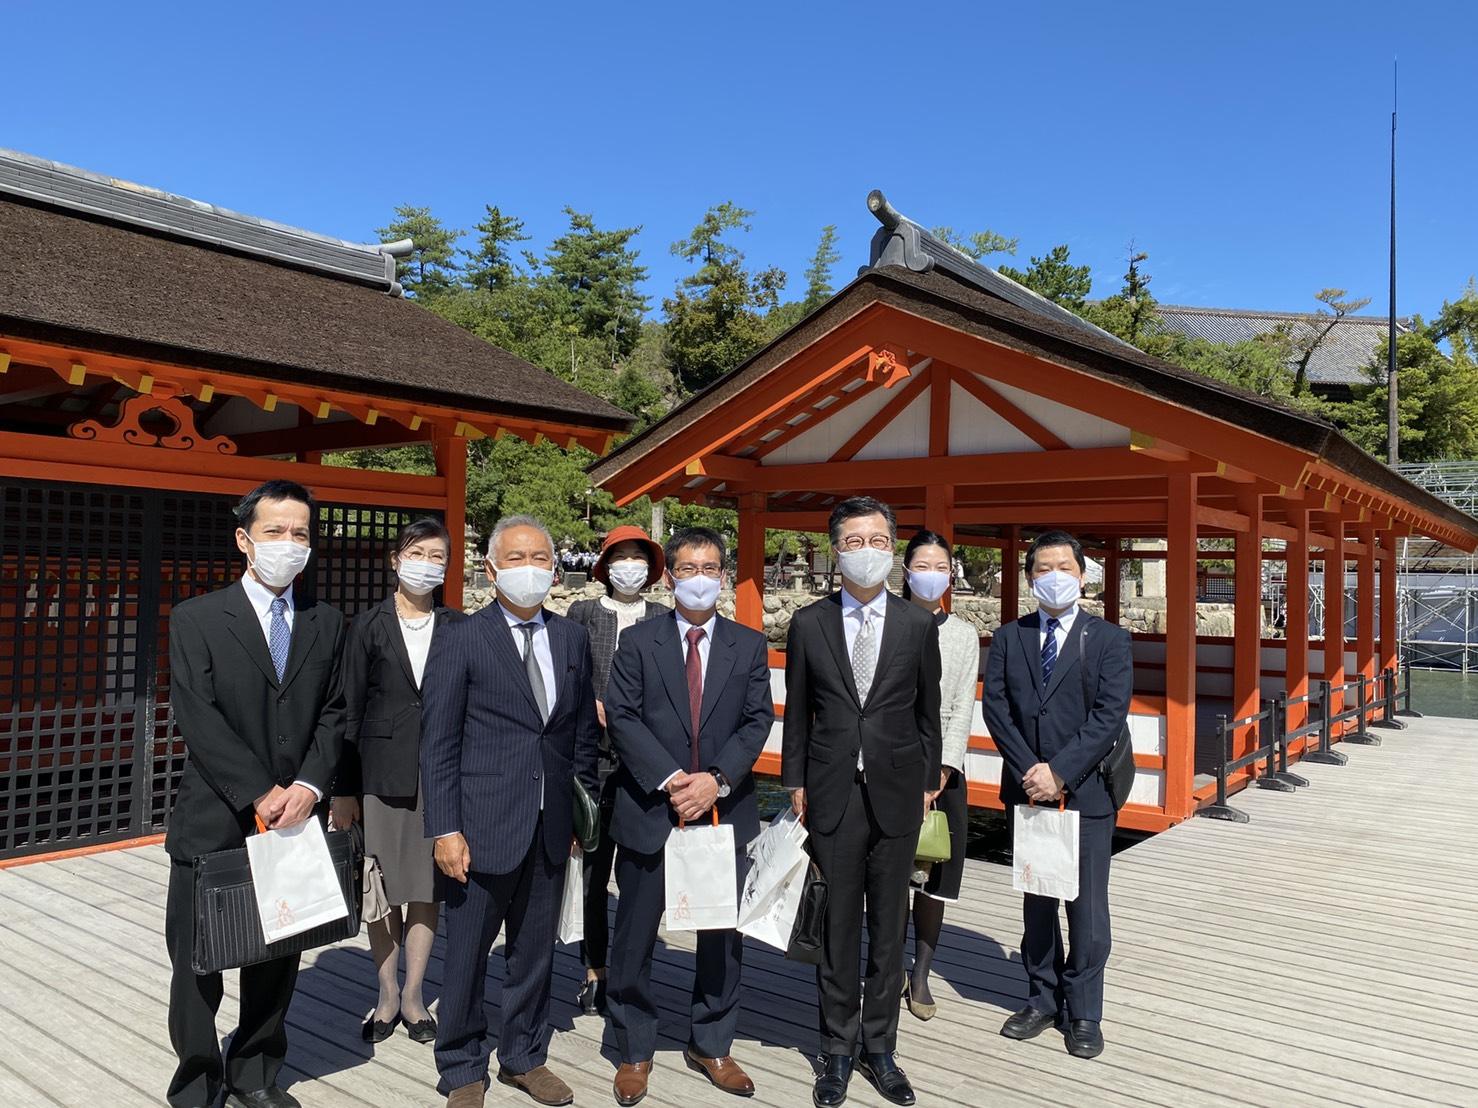 宮島・厳島神社で 広島蒲鉾の献上祭